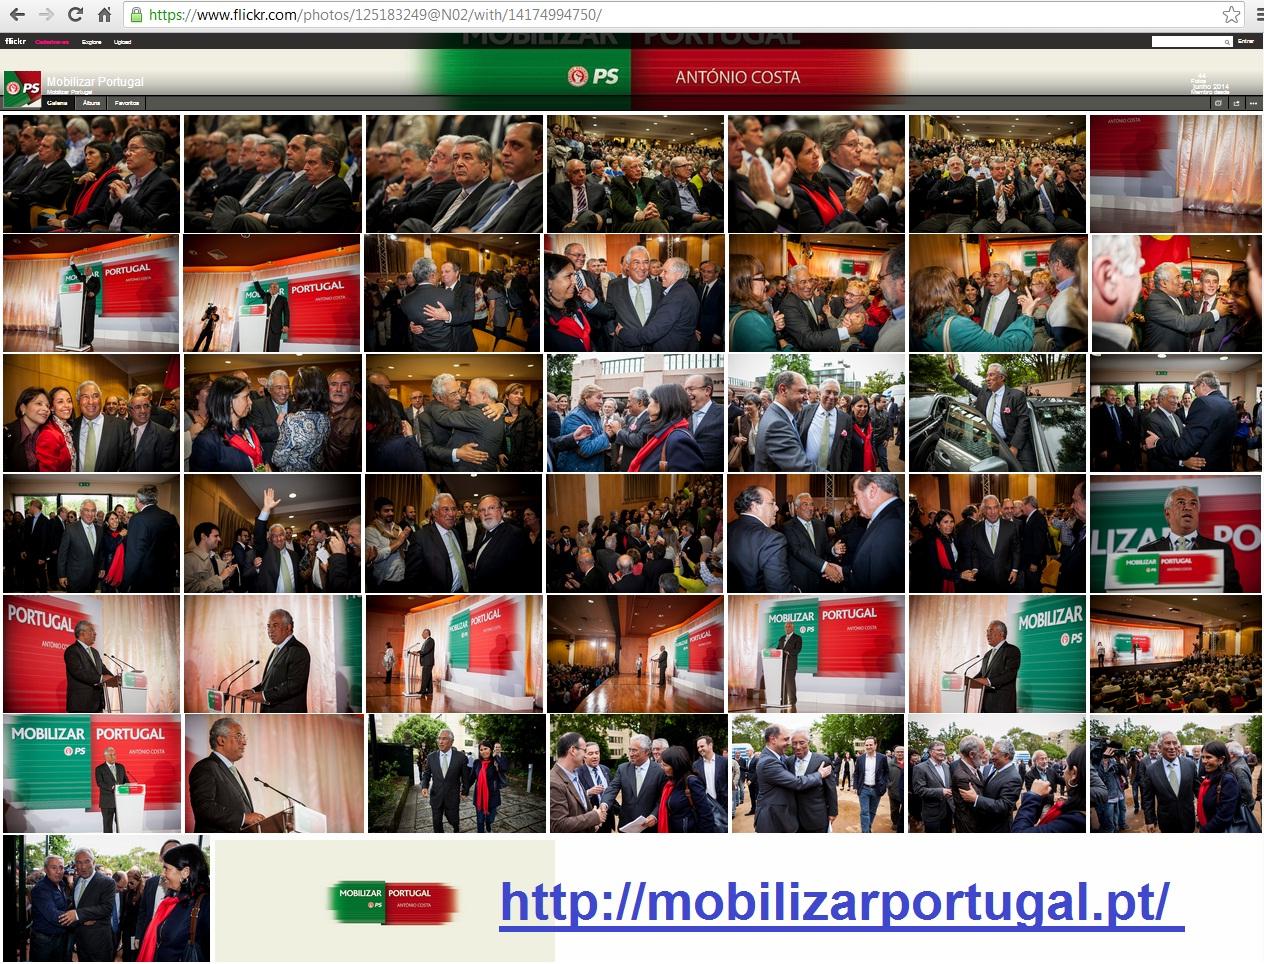 ps socialista António Costa mobilizar Portugal e José Seguro Novo Rumo